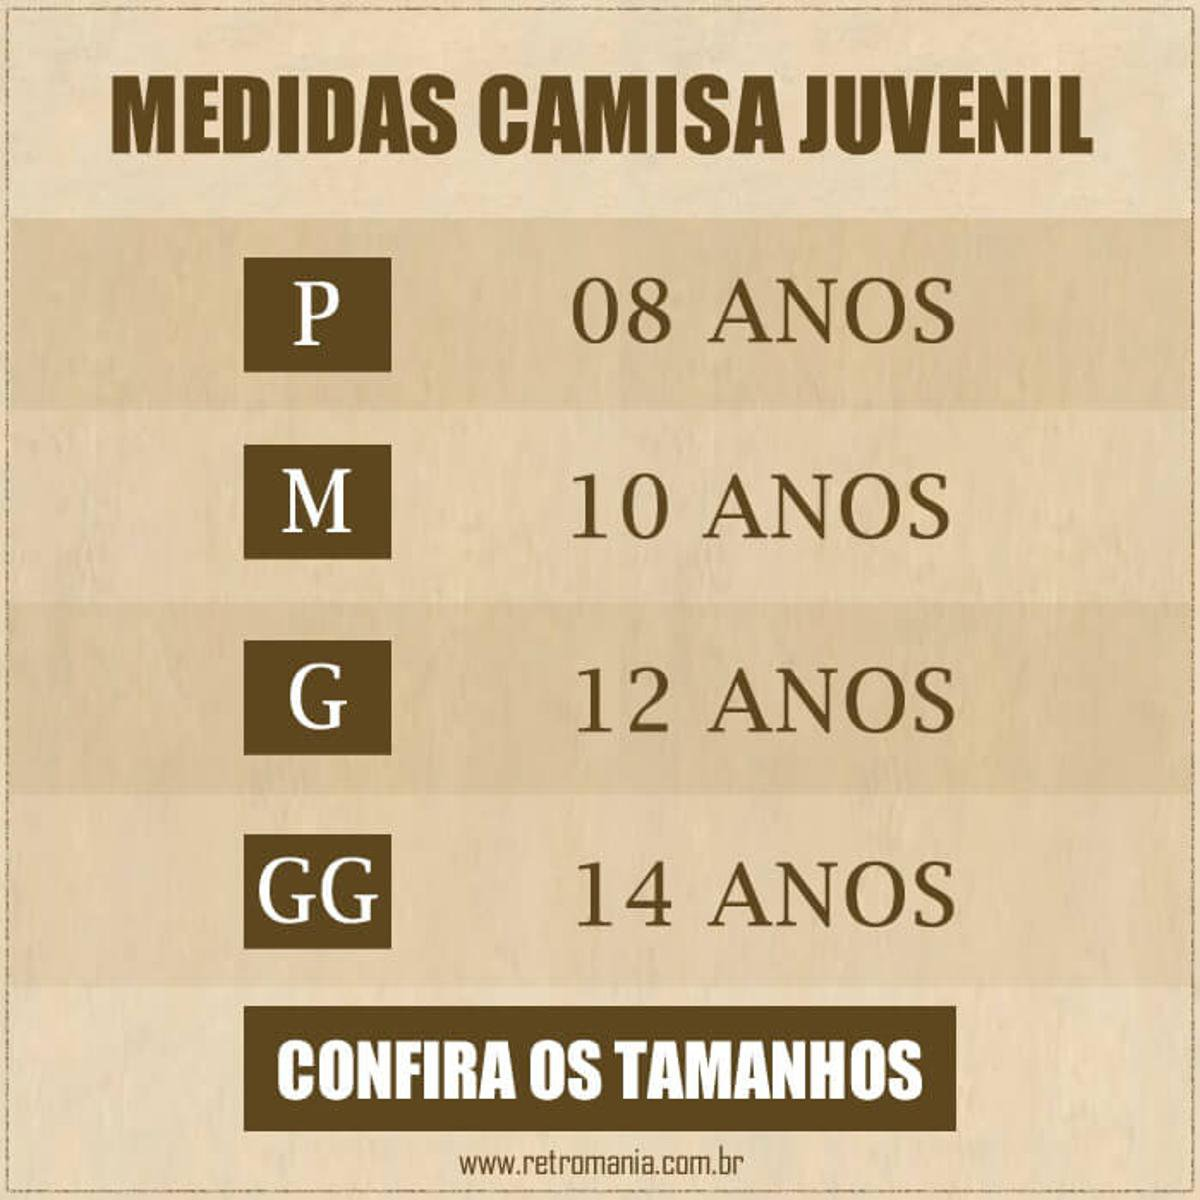 Camisa Retrô Mania Juvenil Vasco da Gama 1988 - Branco e Preto ... 0c20f0362ba1c